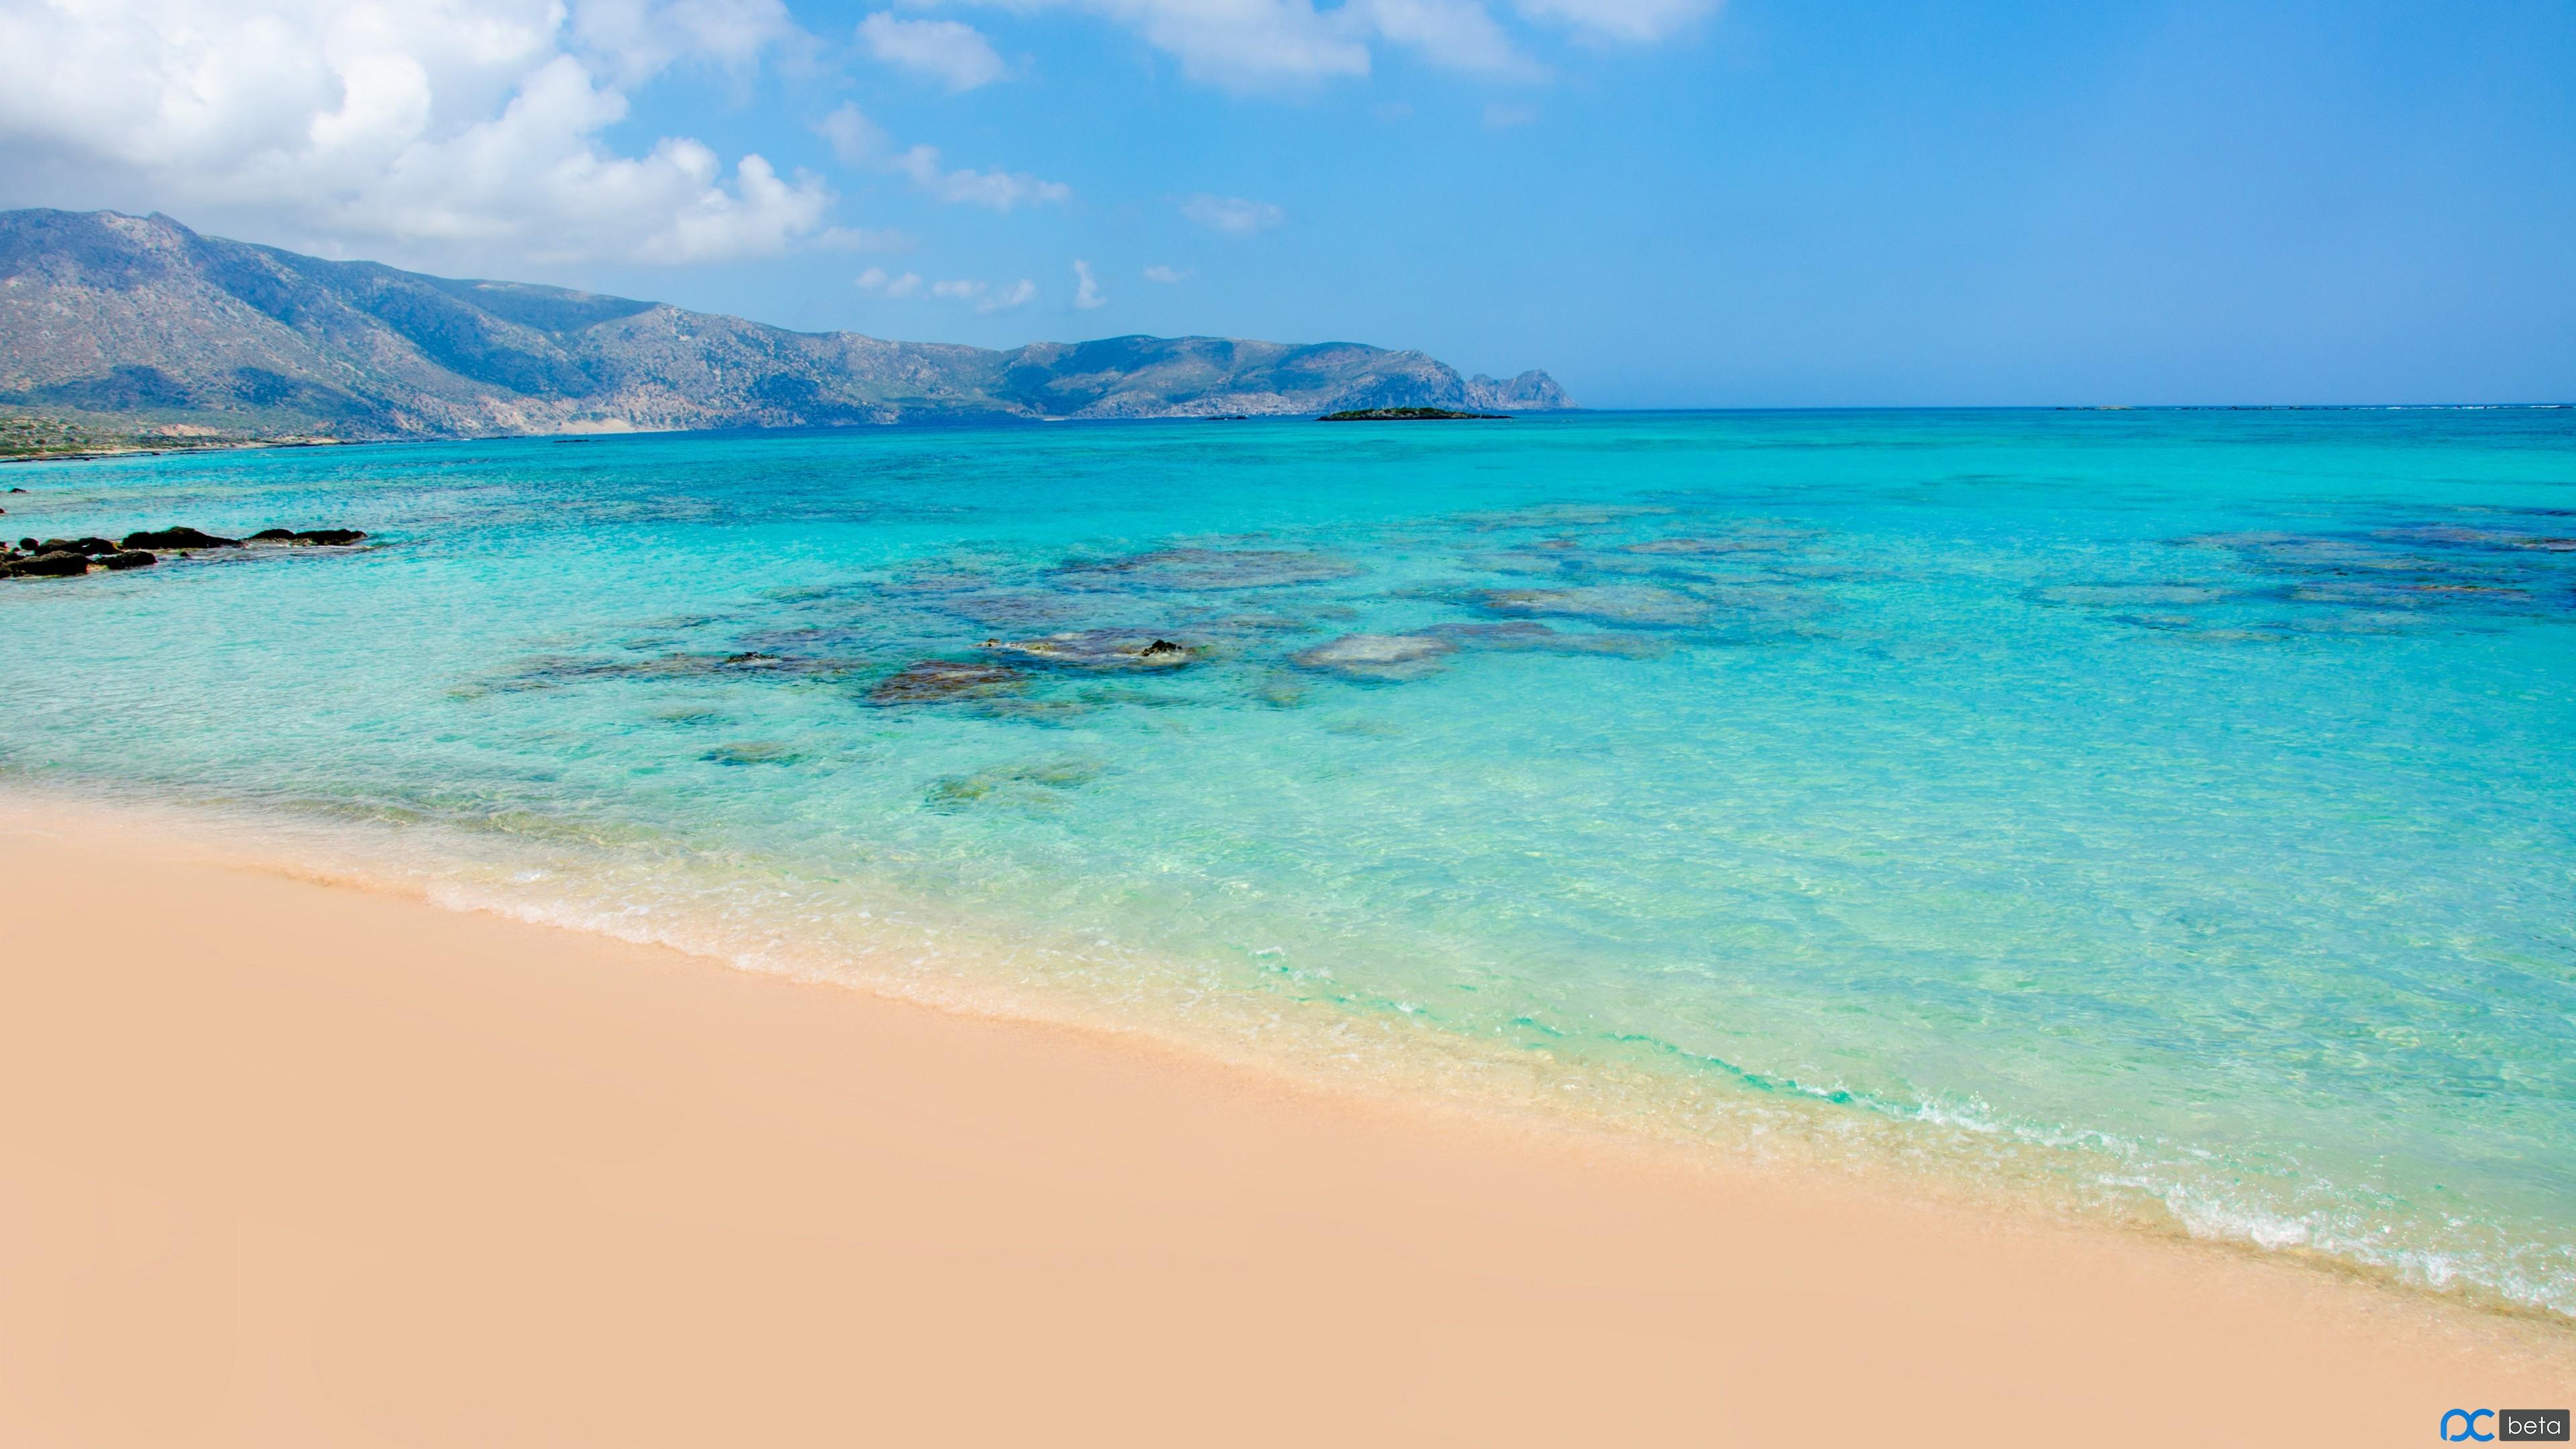 beach-3840x2160-5k-4k-wallpaper-sea-shore-sand-sea-waves-6475.jpg